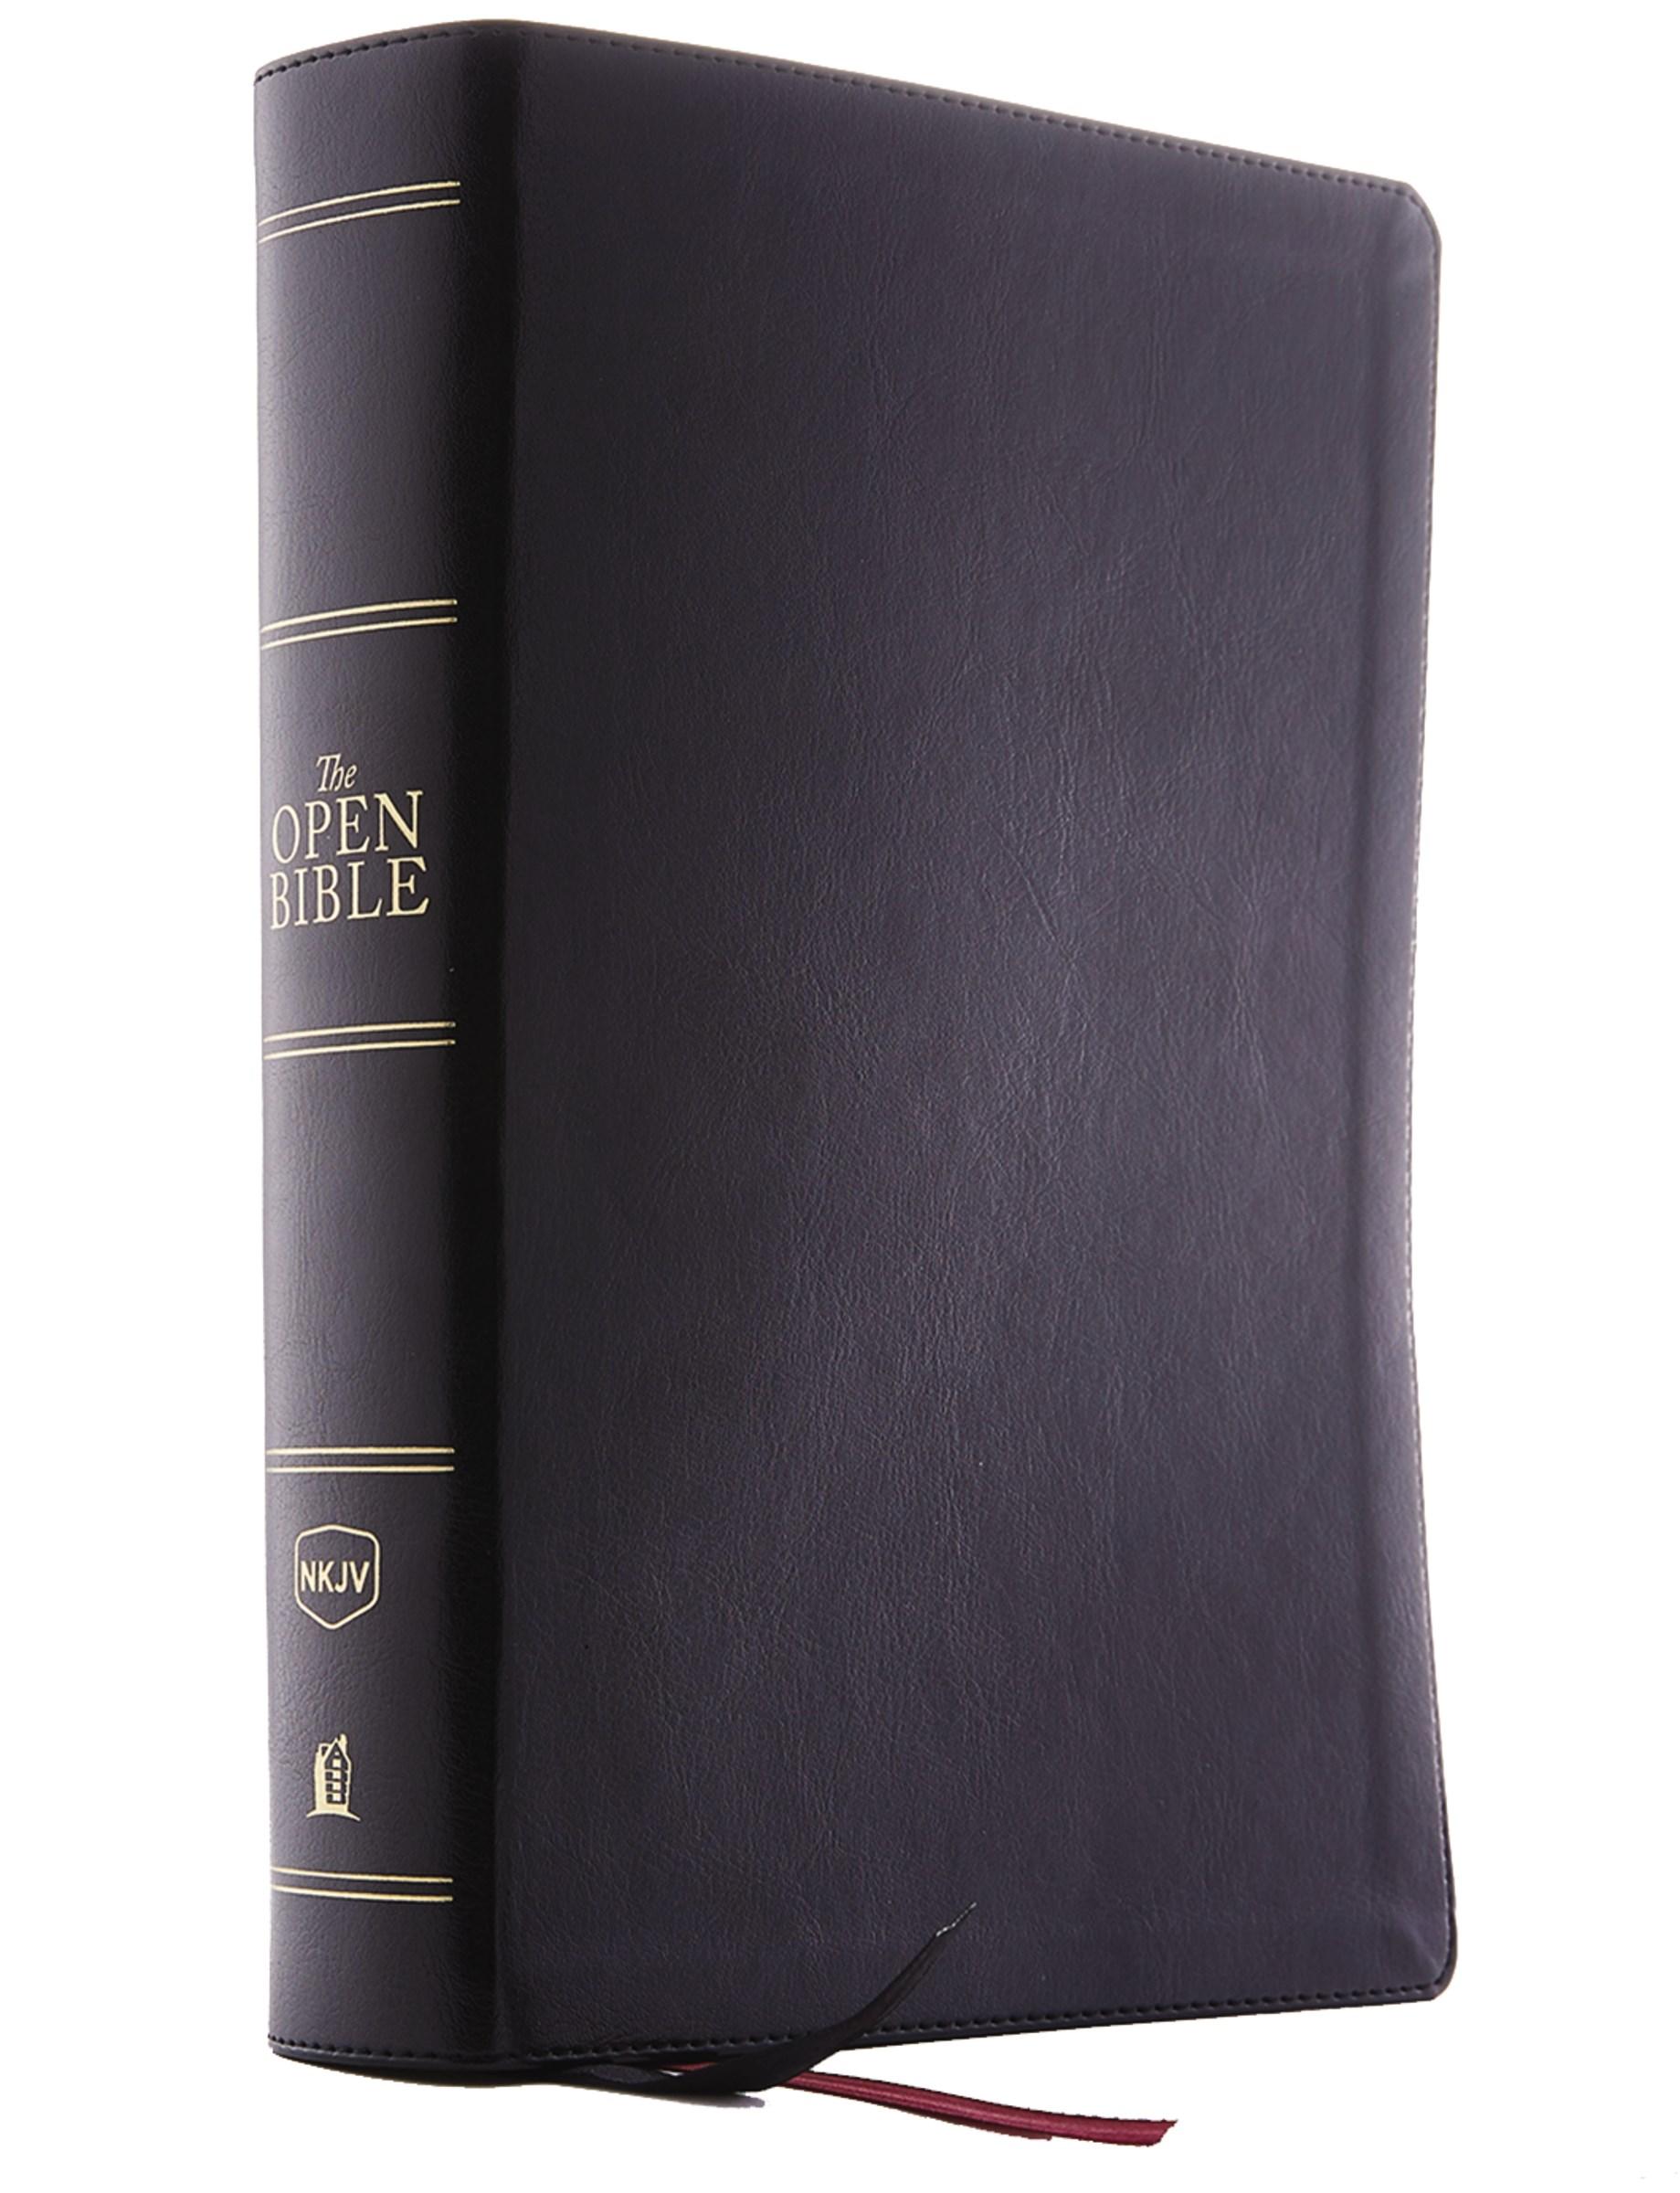 NKJV Open Bible (Comfort Print)-Black Leathersoft